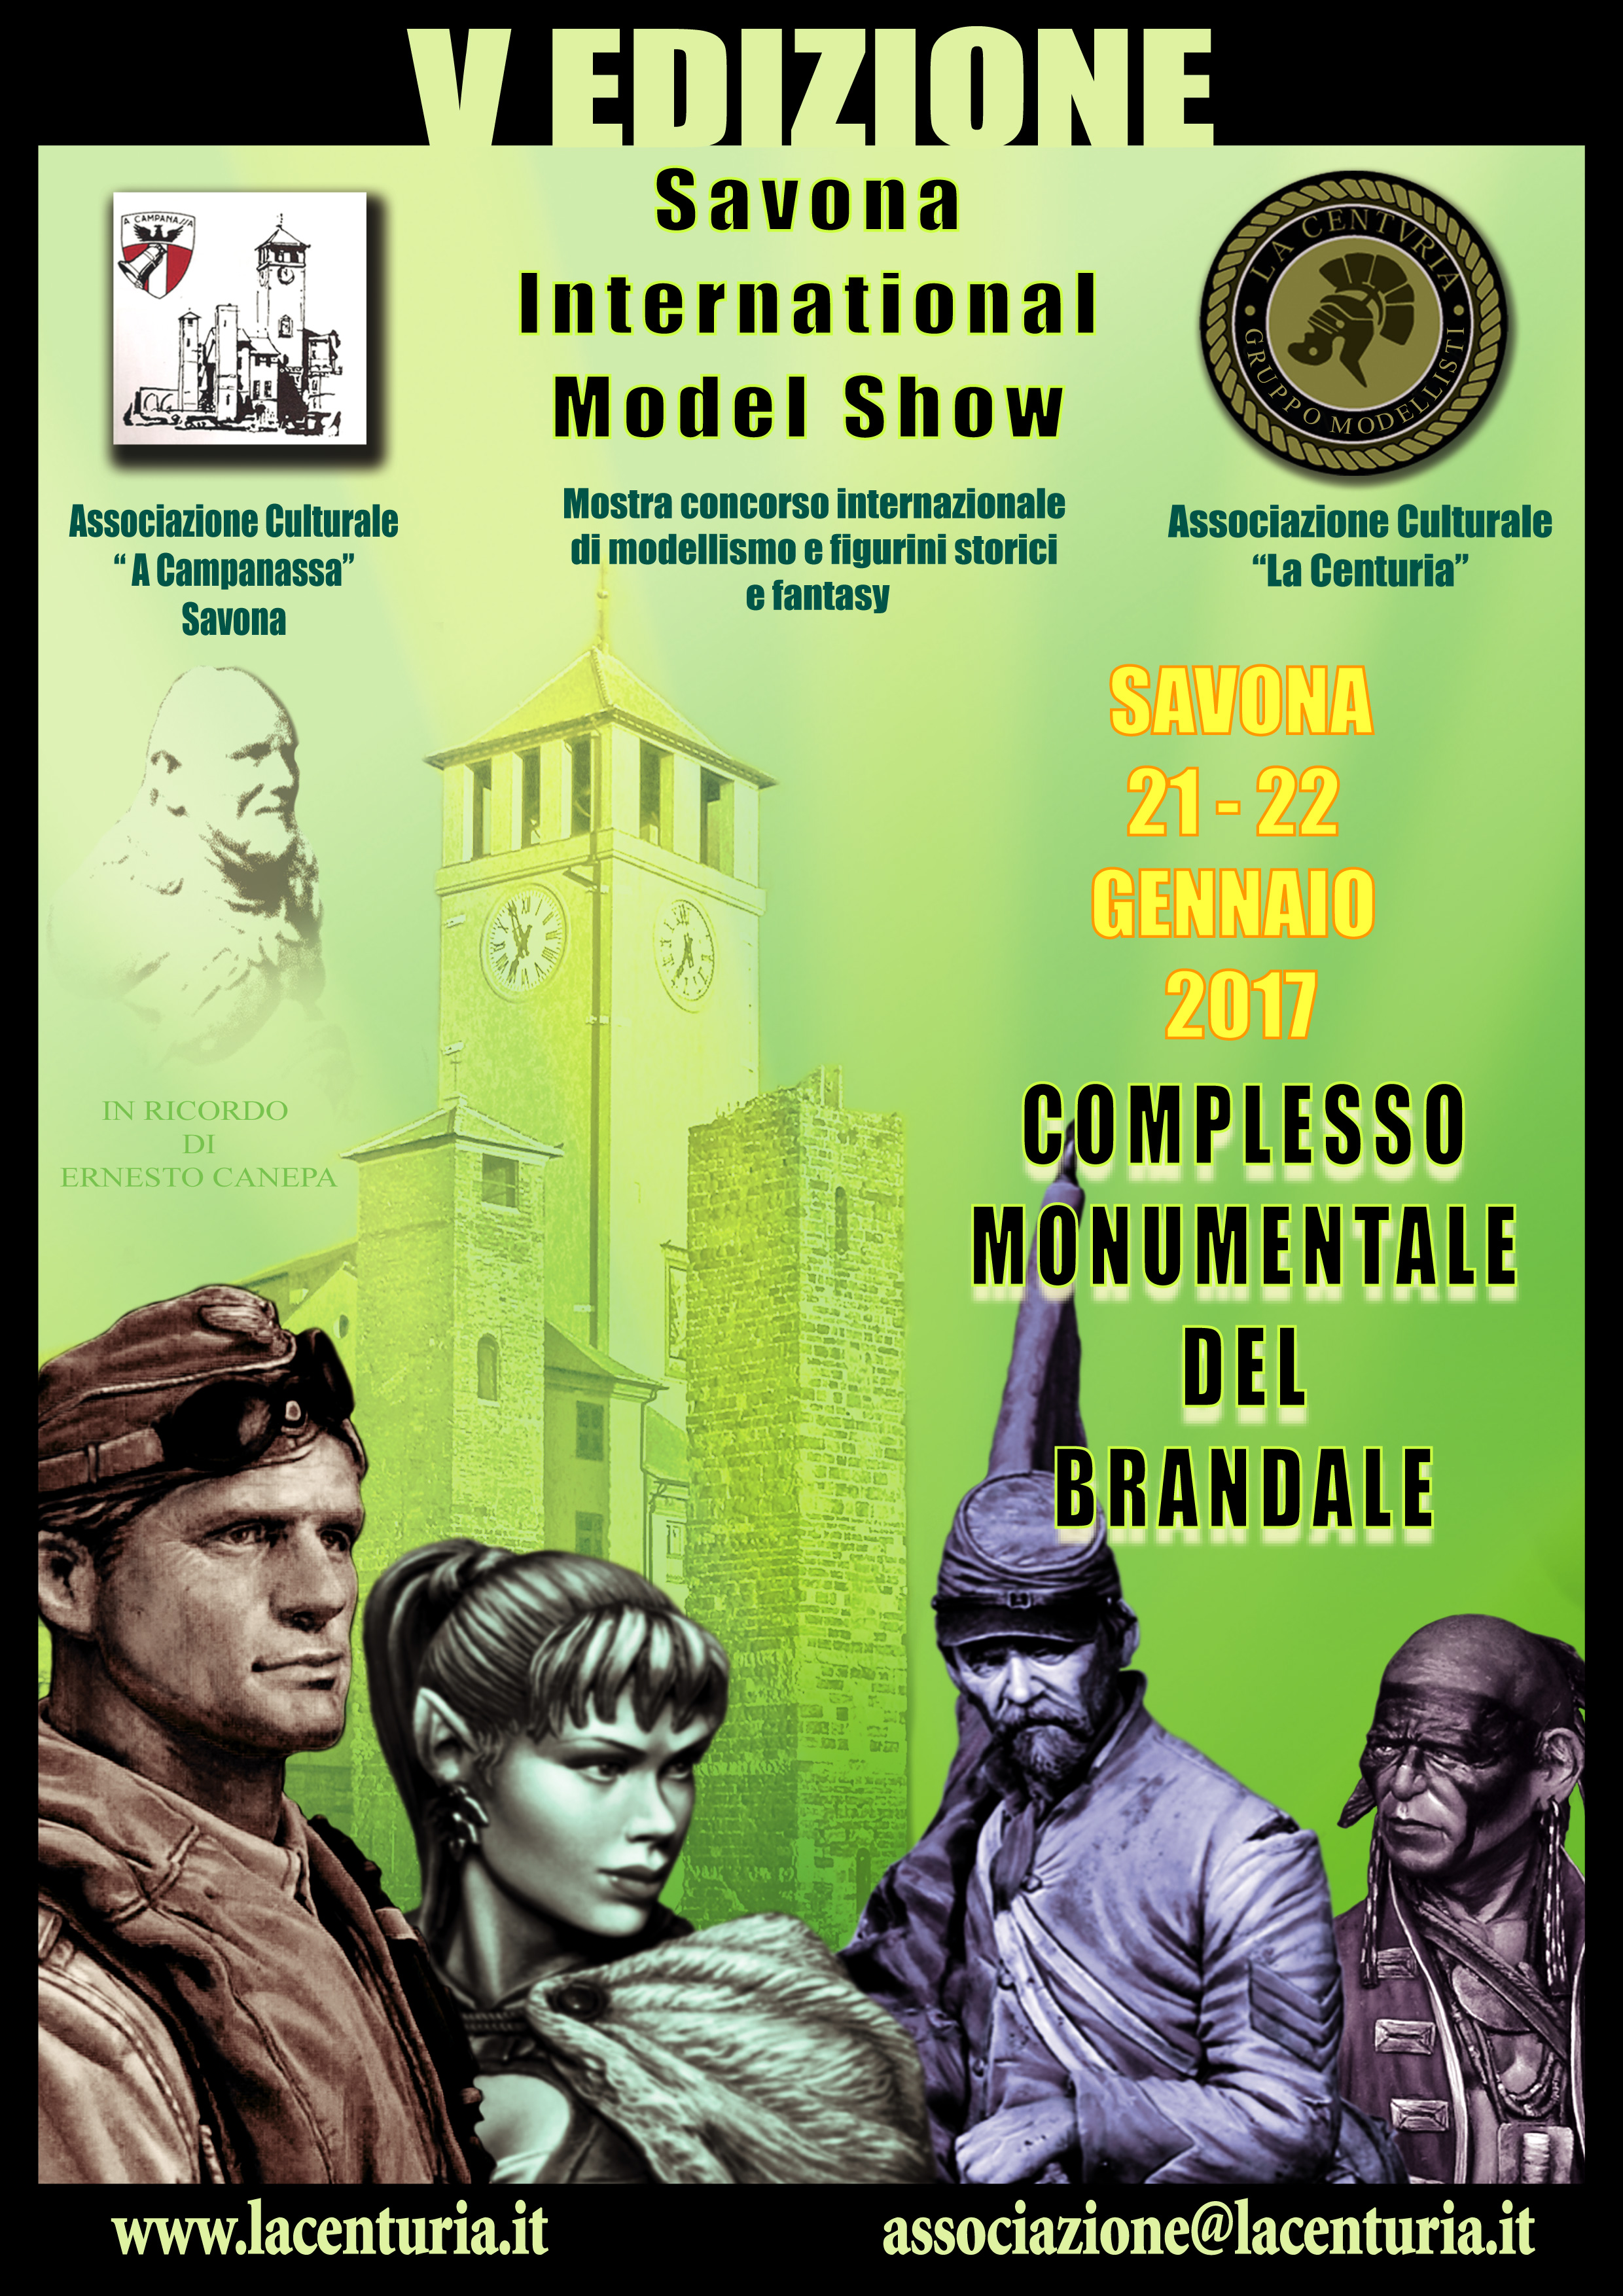 Savona international Model Show